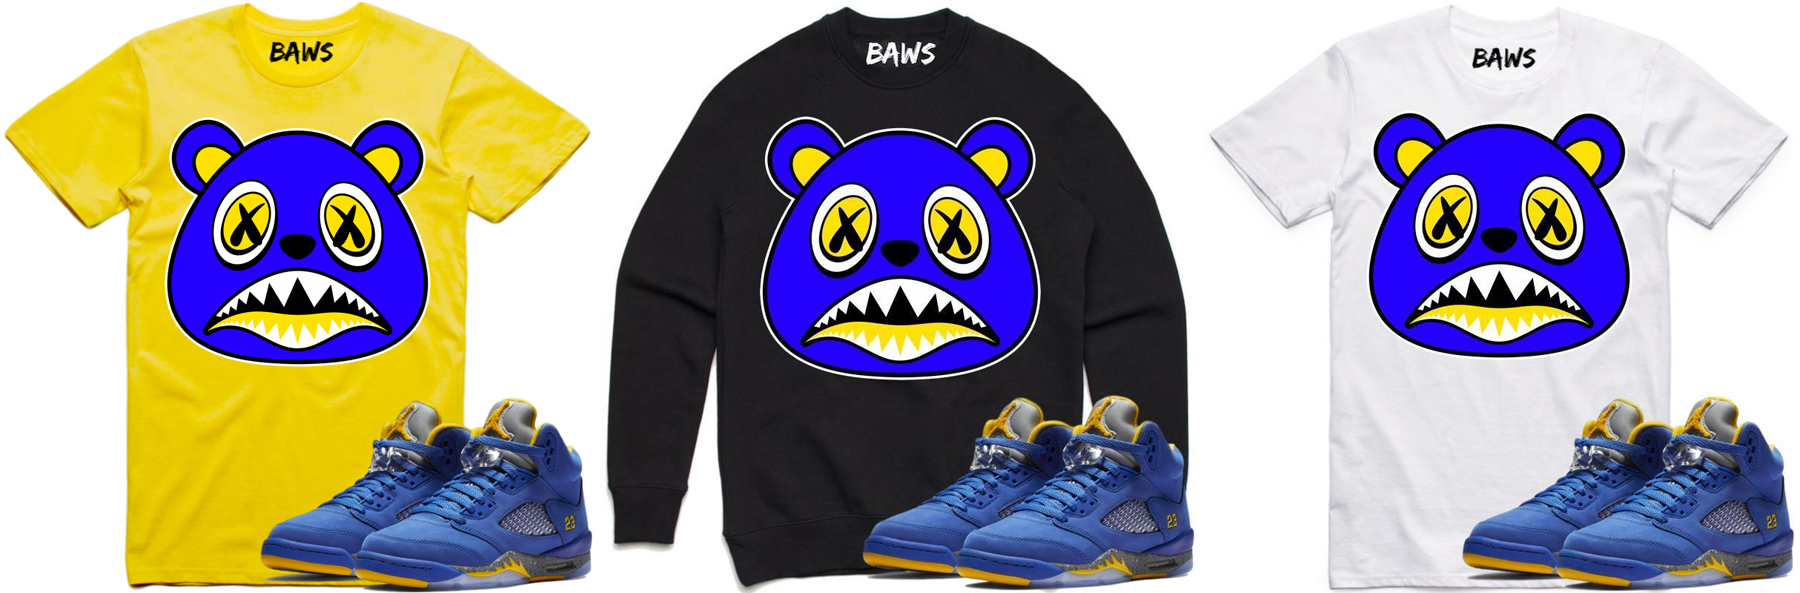 jordan-5-laney-baws-sneaker-shirts